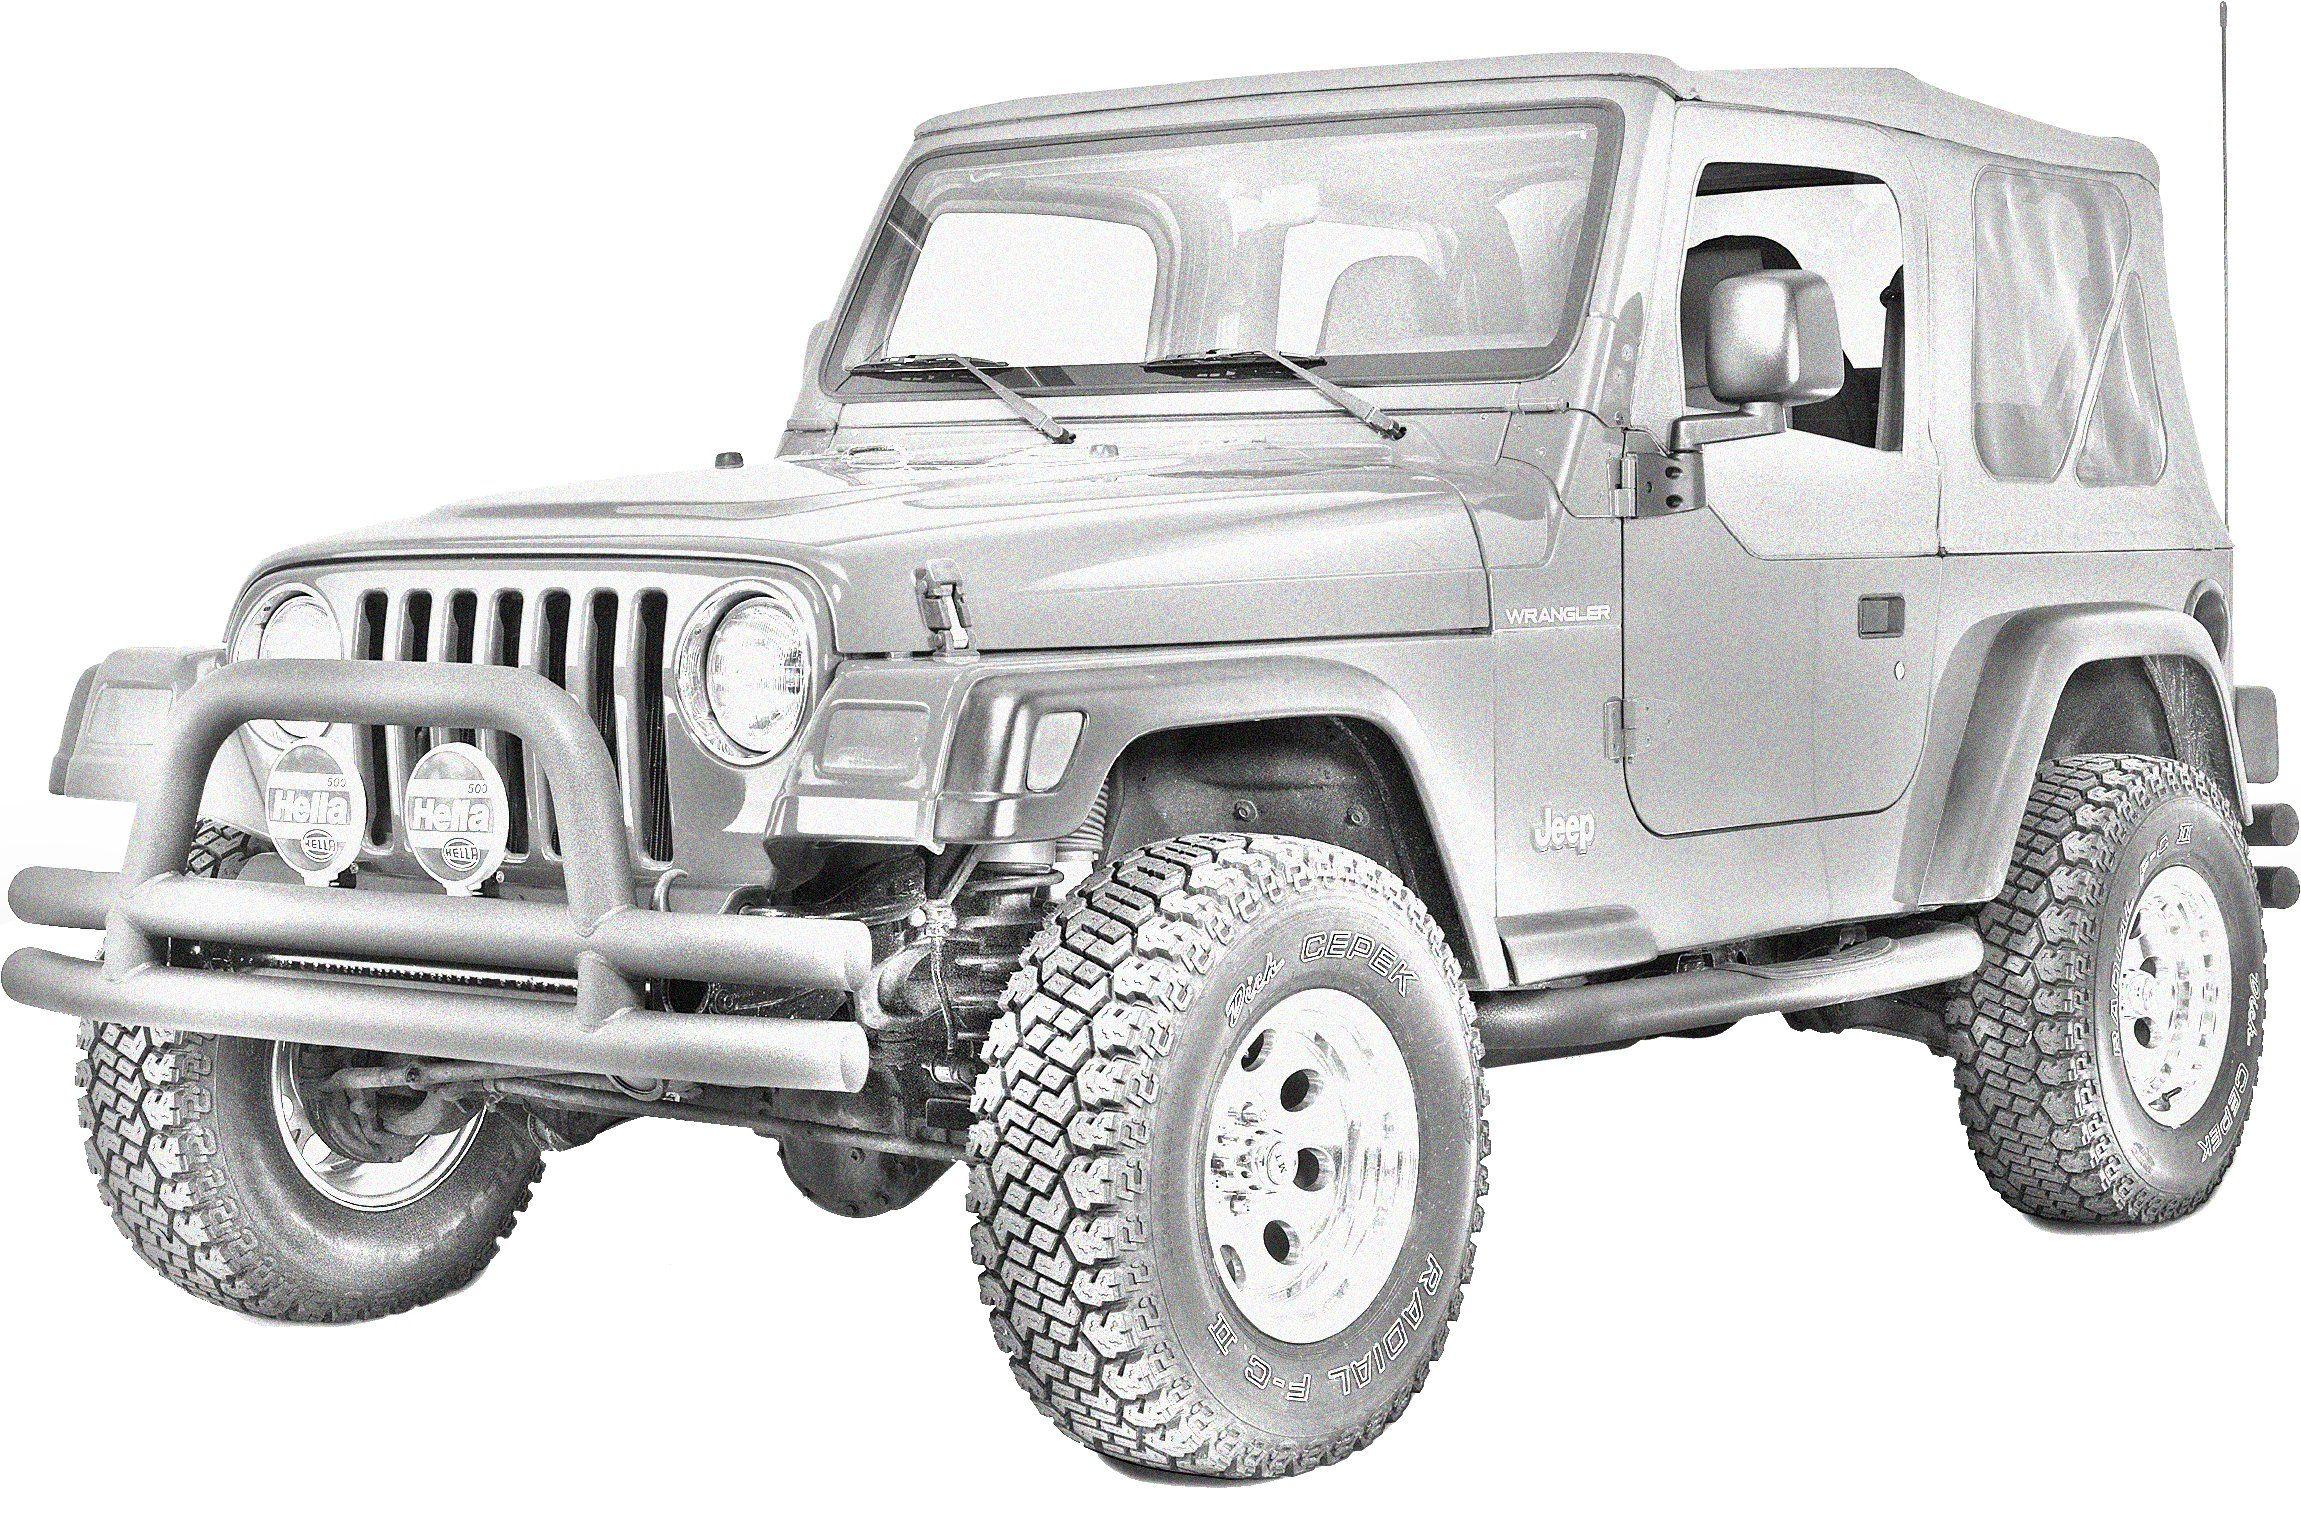 1997 2006 Jeep Wrangler TJ Replacement Parts | Quadratec